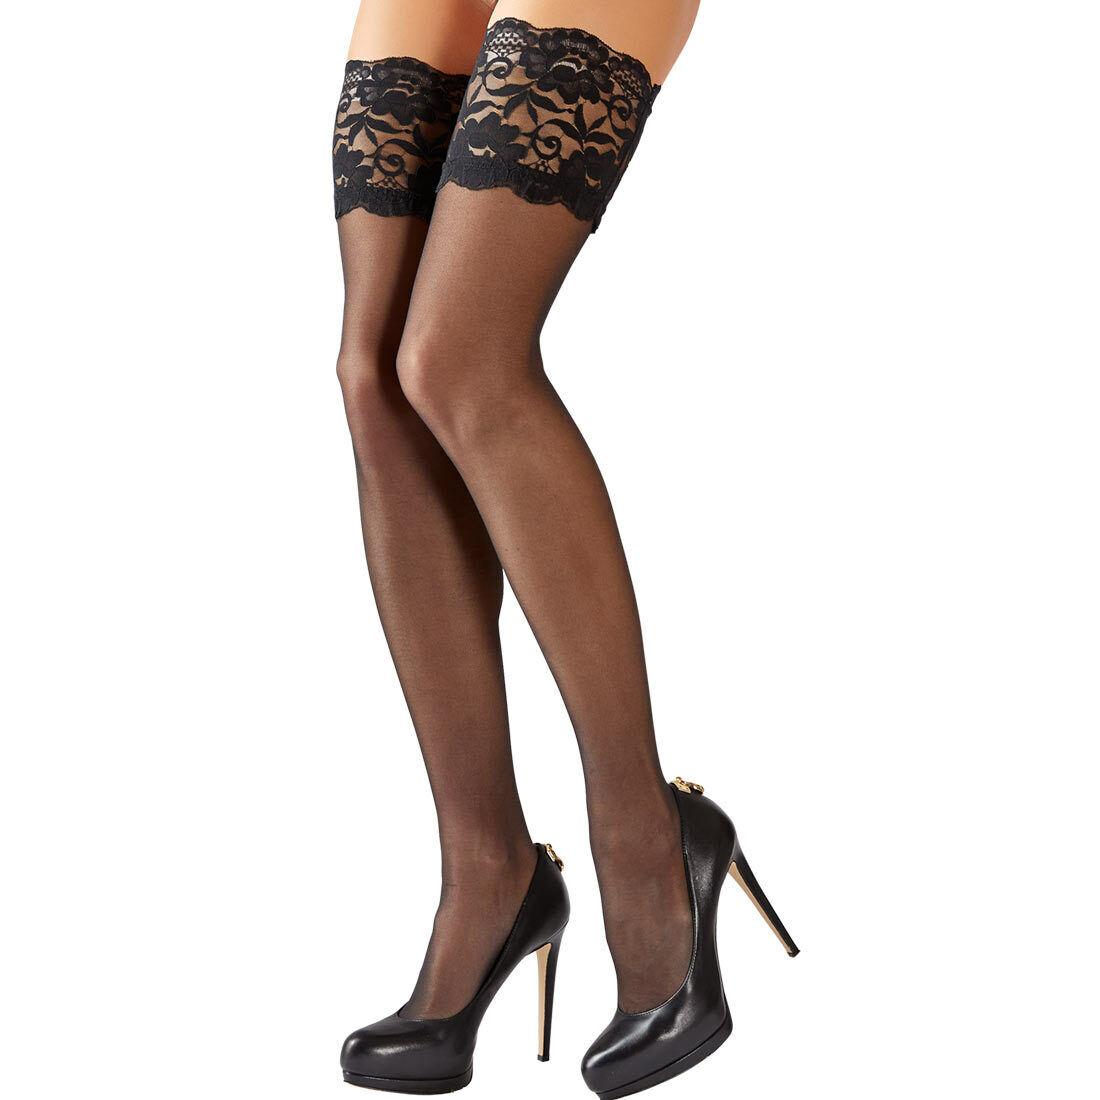 Sexy Halterlose Damen Strümpfe Nylons Silikon stockings M L XL 2XL